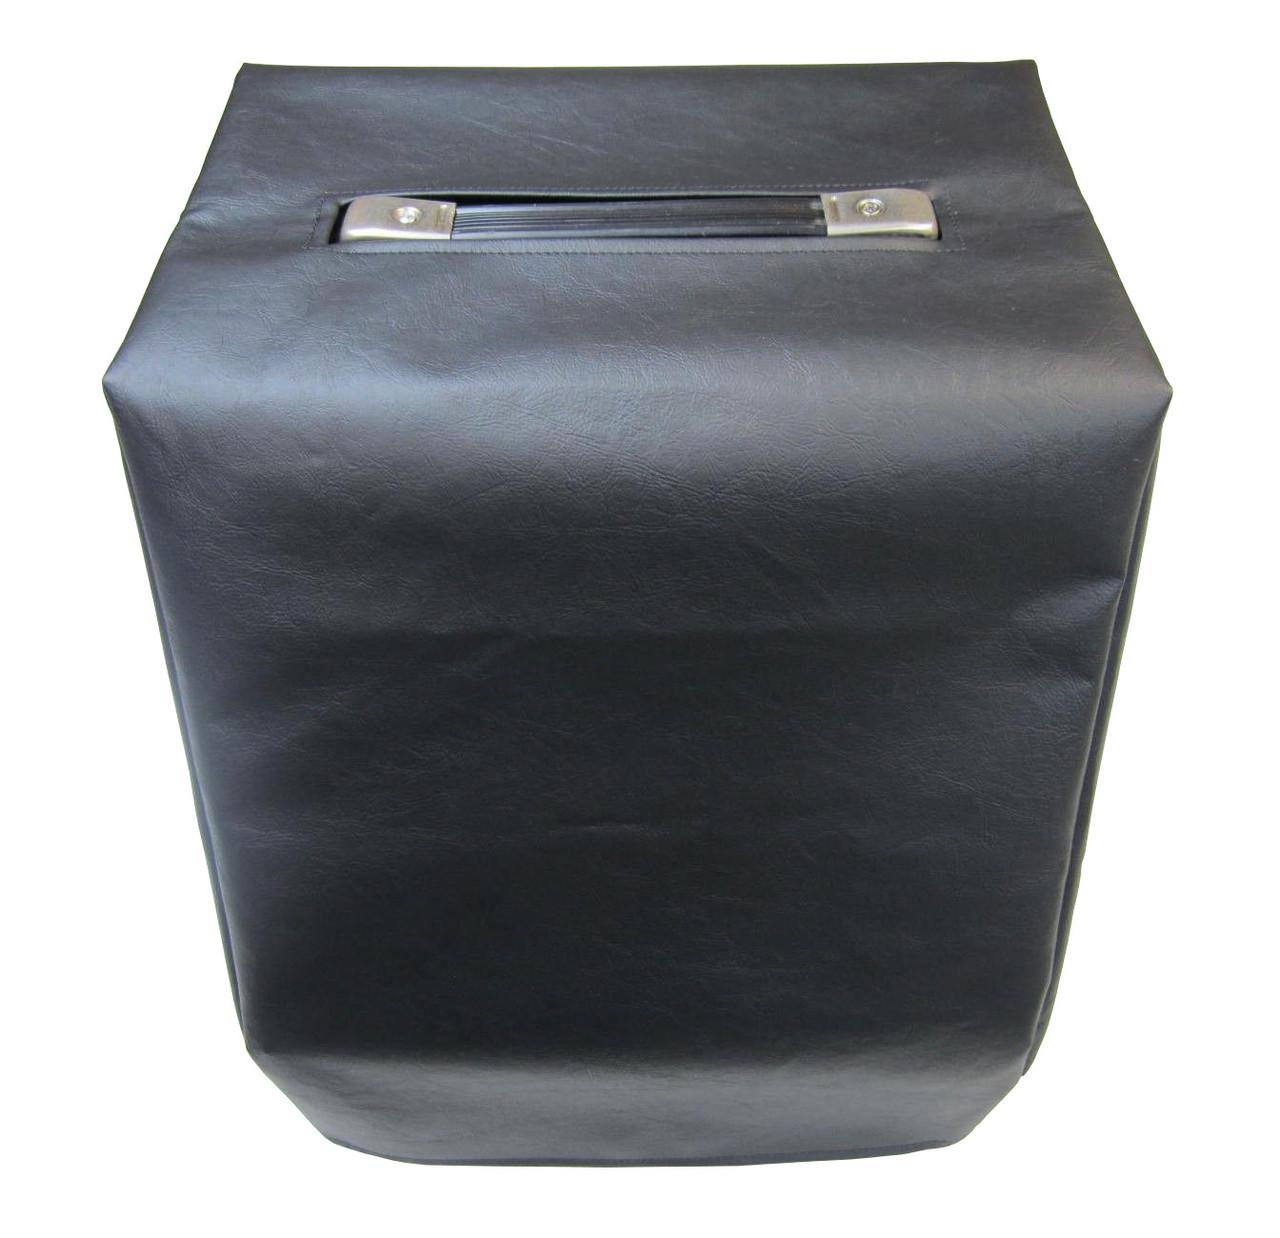 "Tuki Padded Amp Cover for Hartke A70 Bass Amplifier Combo 1//2/"" Foam hart052p"